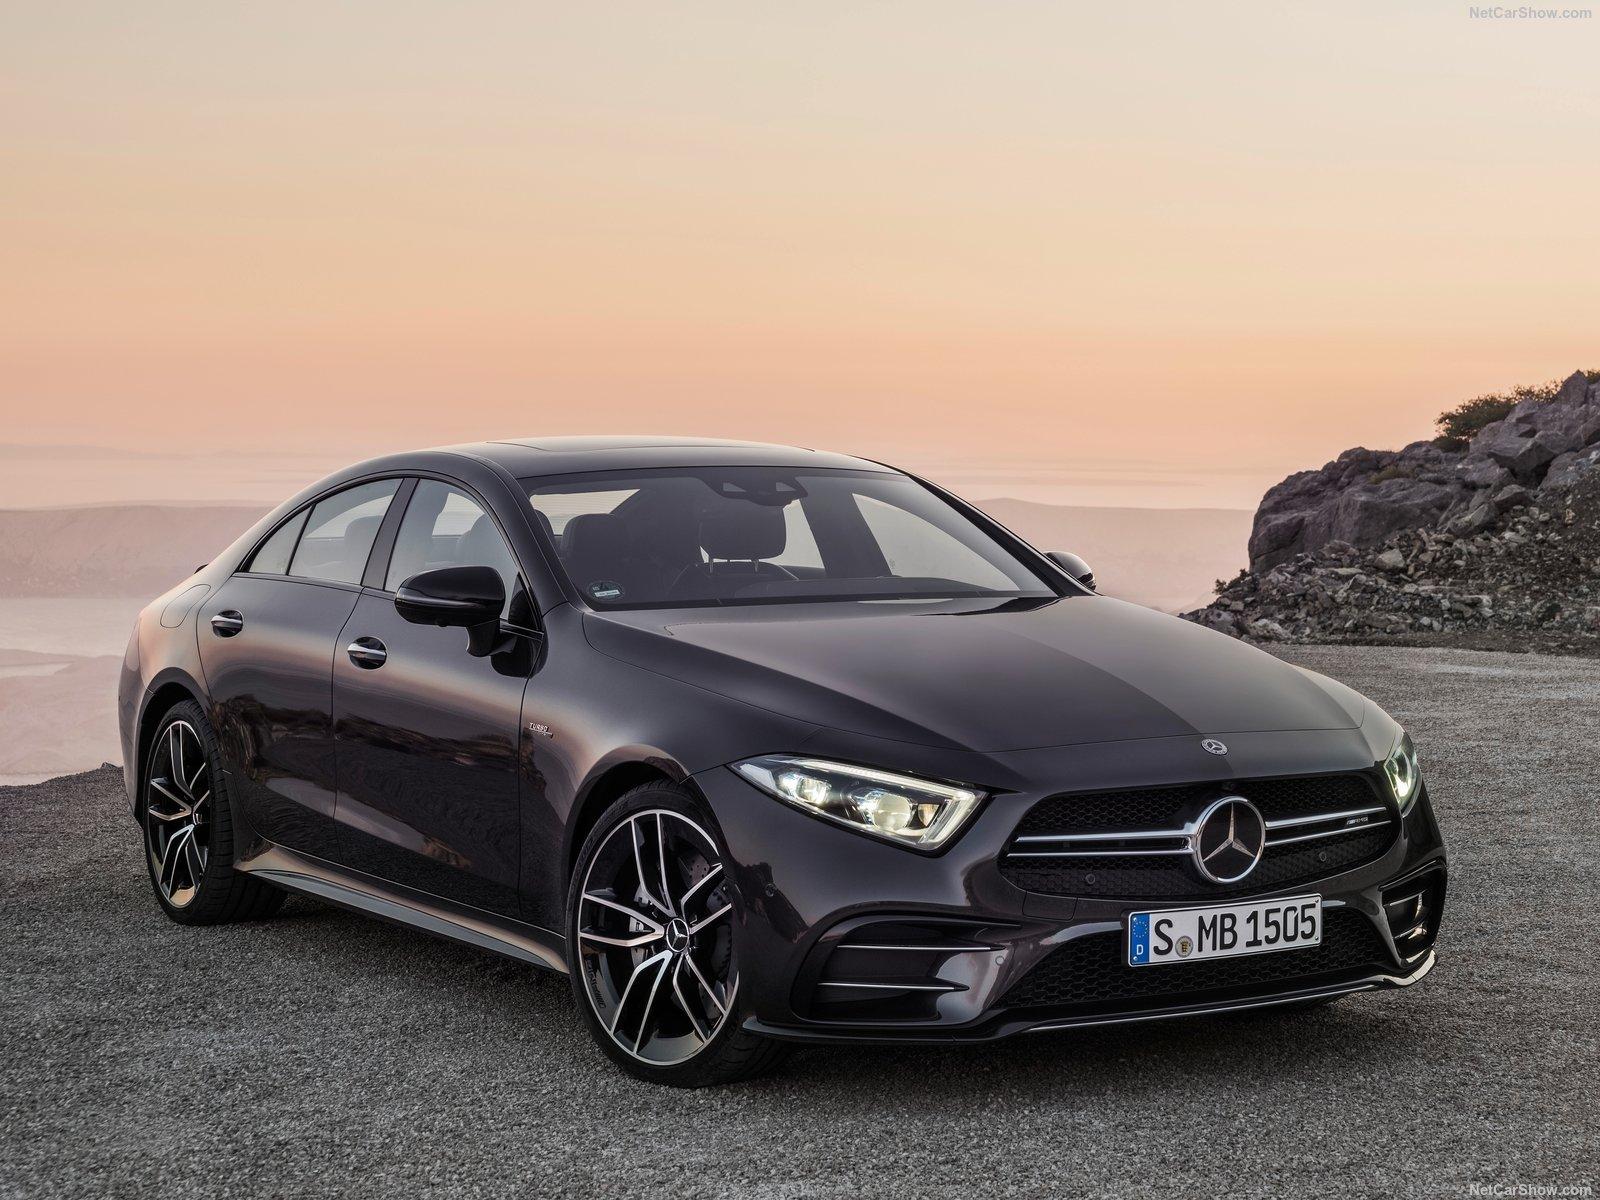 Wallpaper Mercedes Benz Cls53 Amg 2019 Black 1600x1200 Ettie03